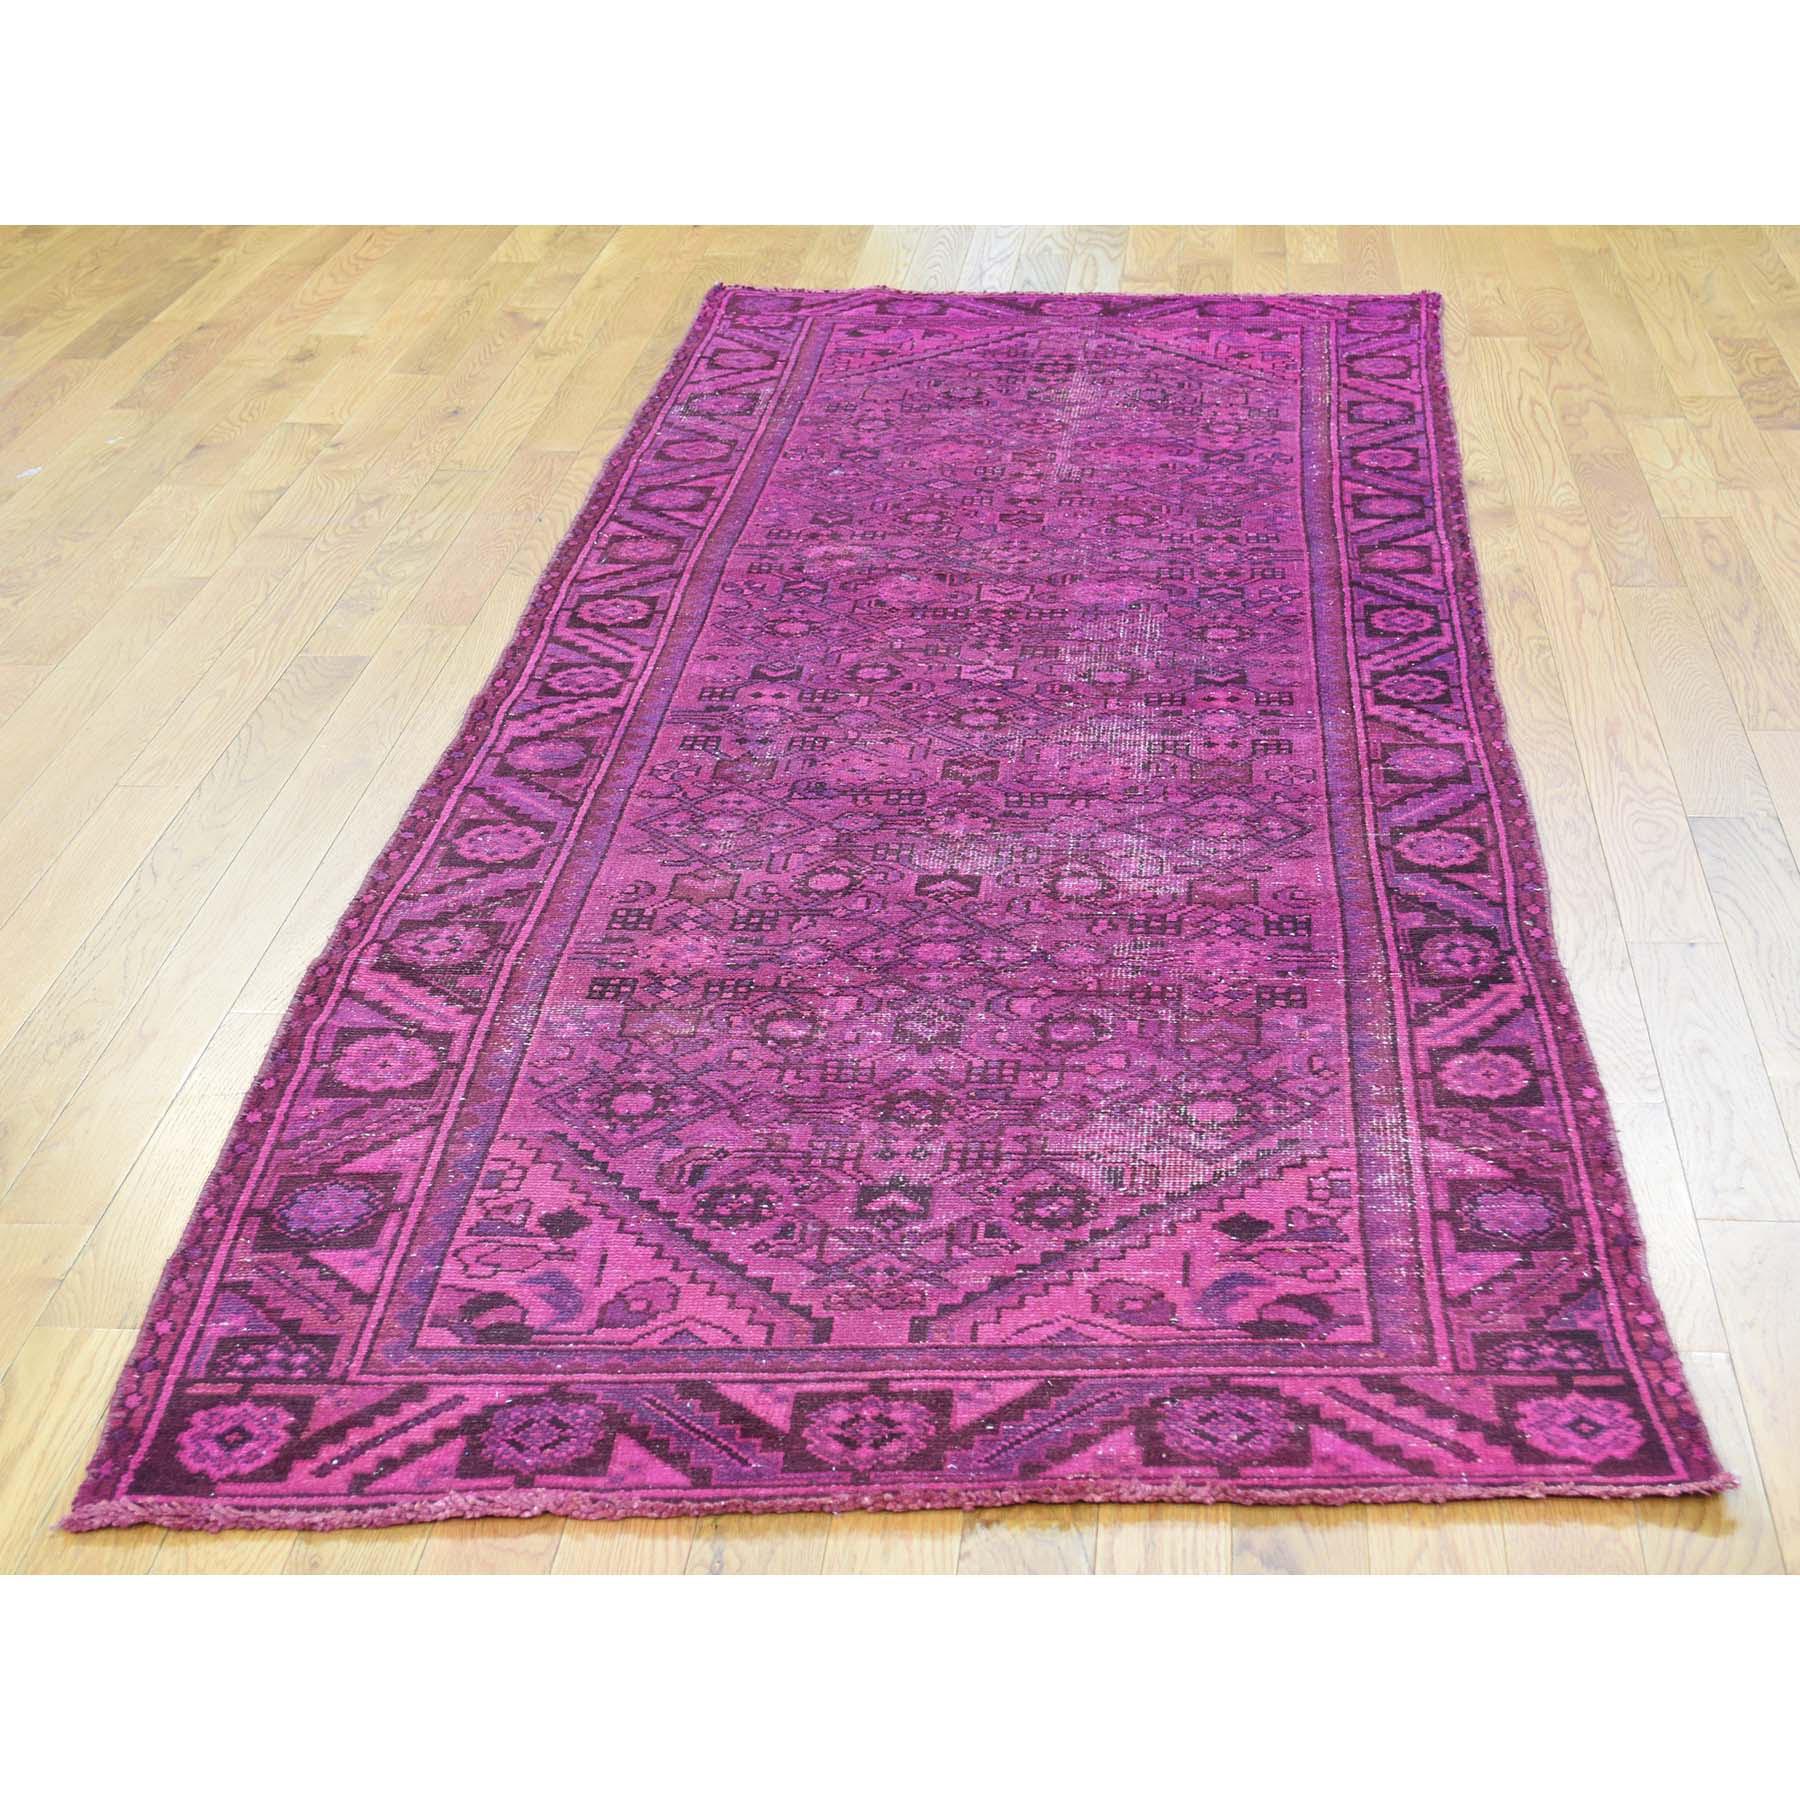 3-4 x9-7  Handmade Overdyed Persian Hussainabad Vintage Runner Rug